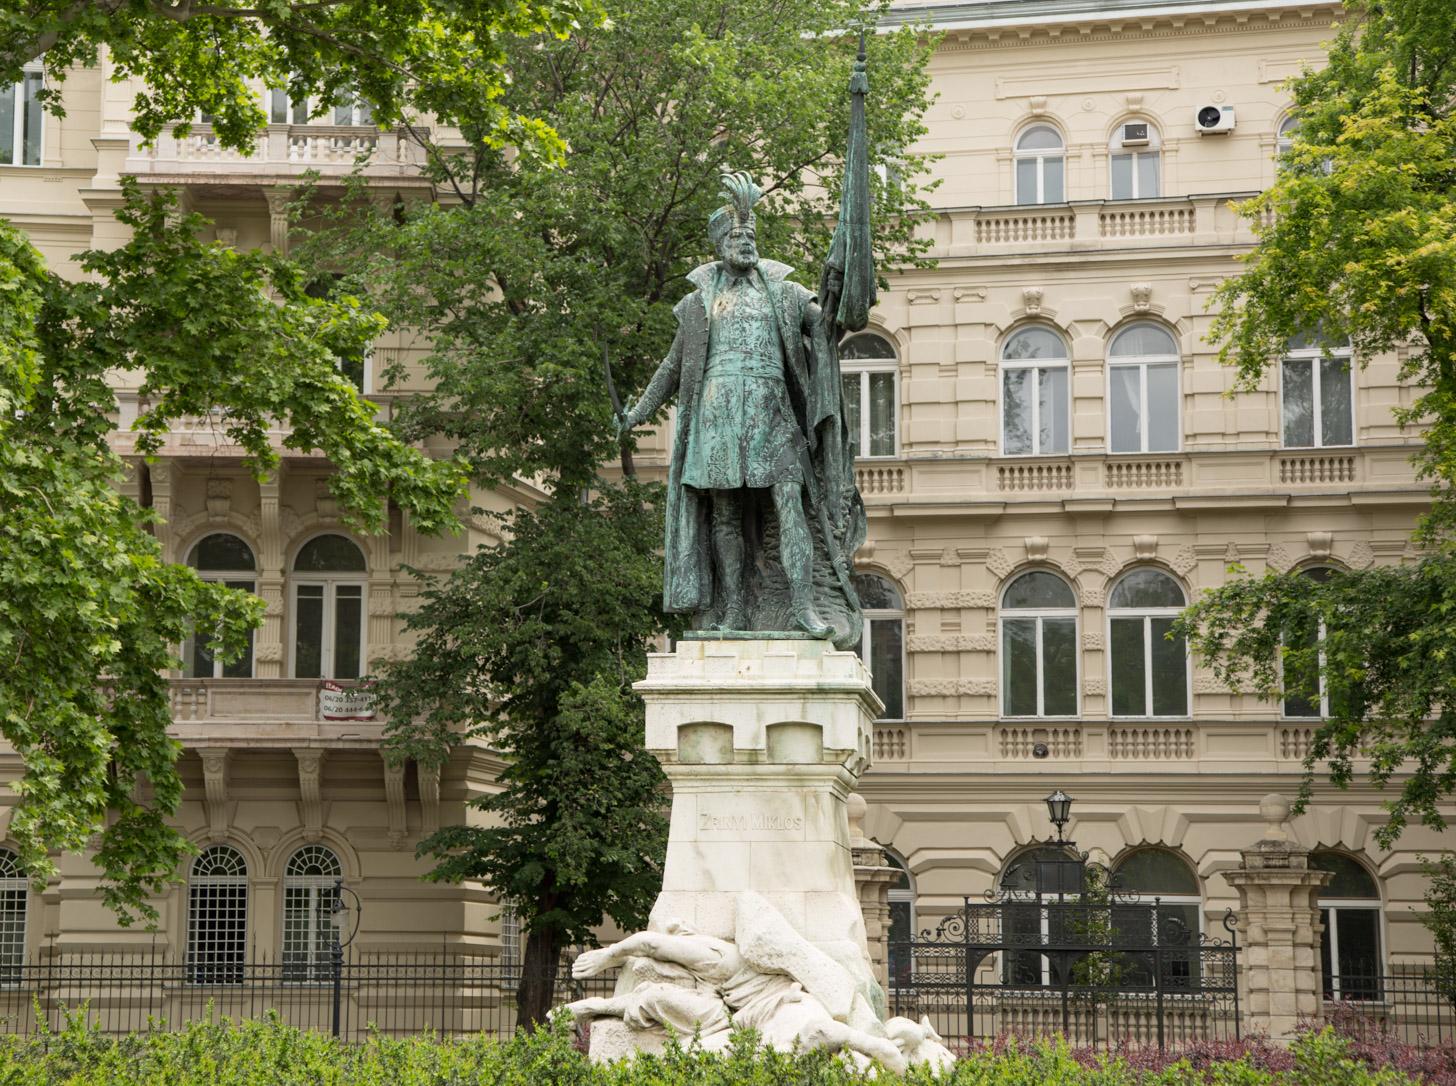 Zrinyi Miklos standbeeld